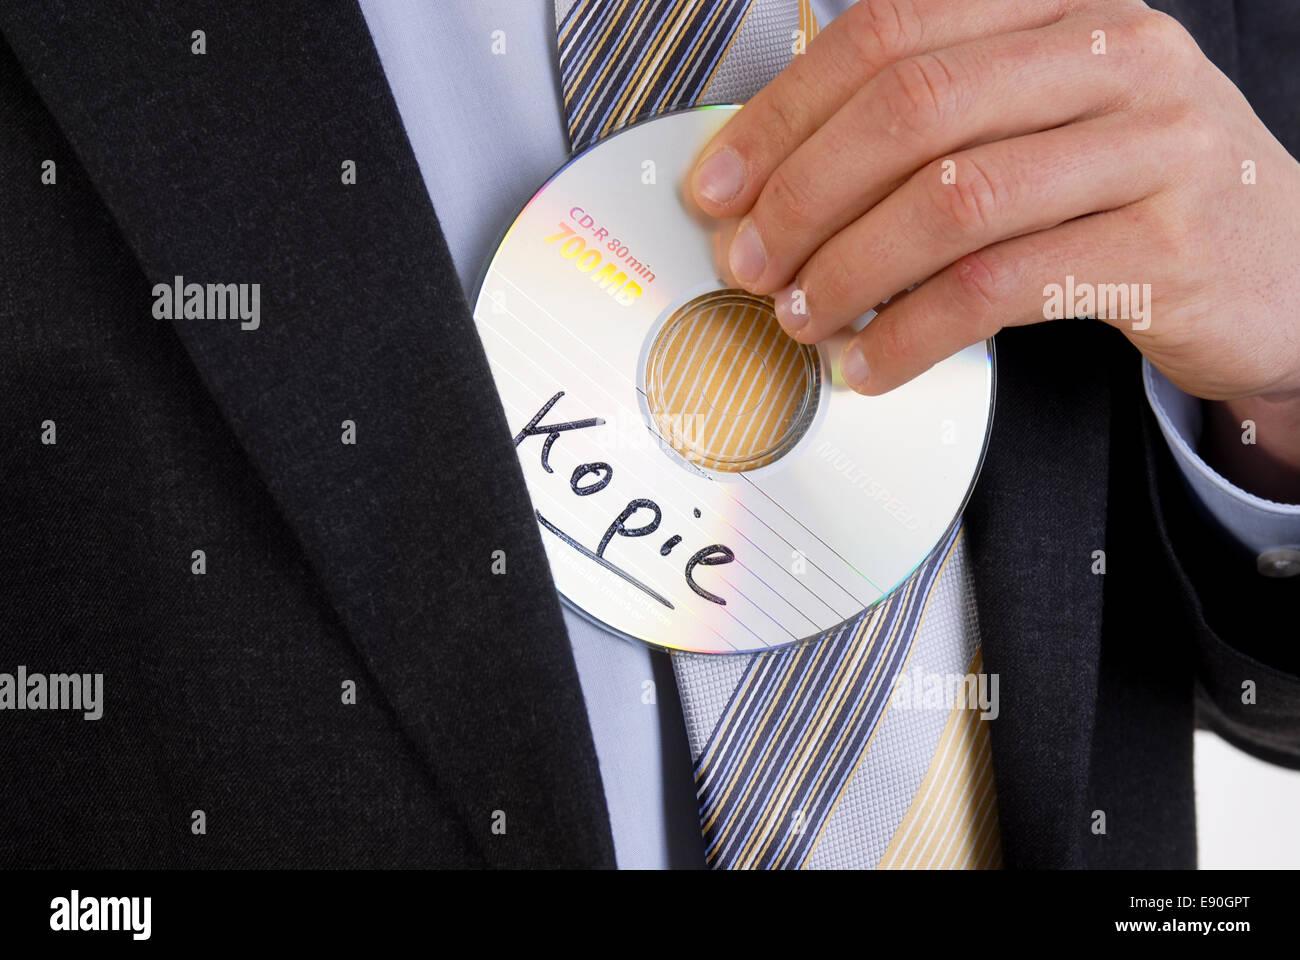 Data safety - Stock Image